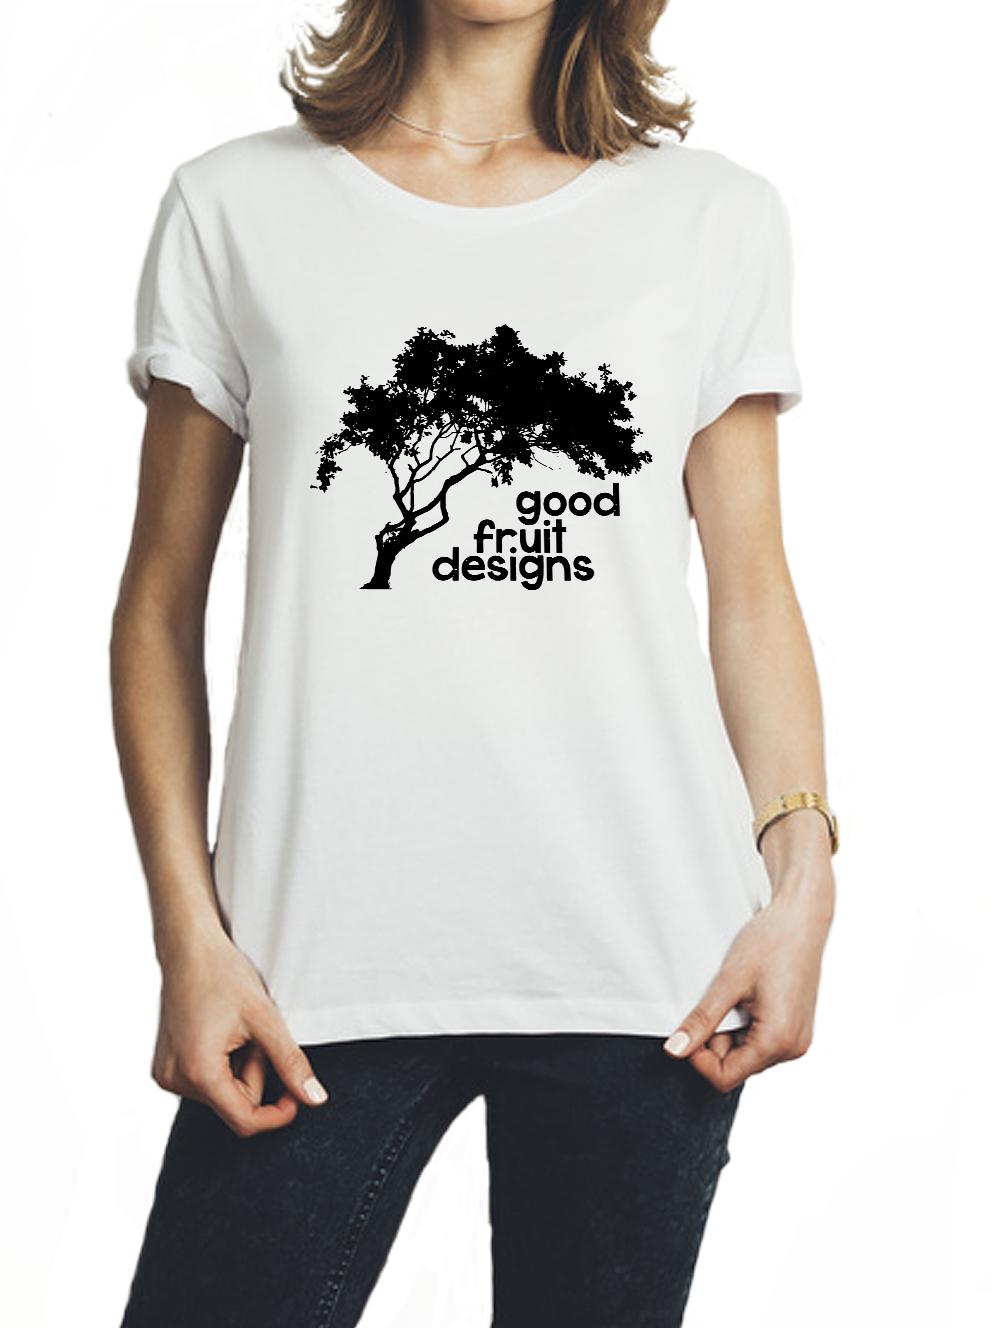 white-shirt-with-black-logo(woman2)